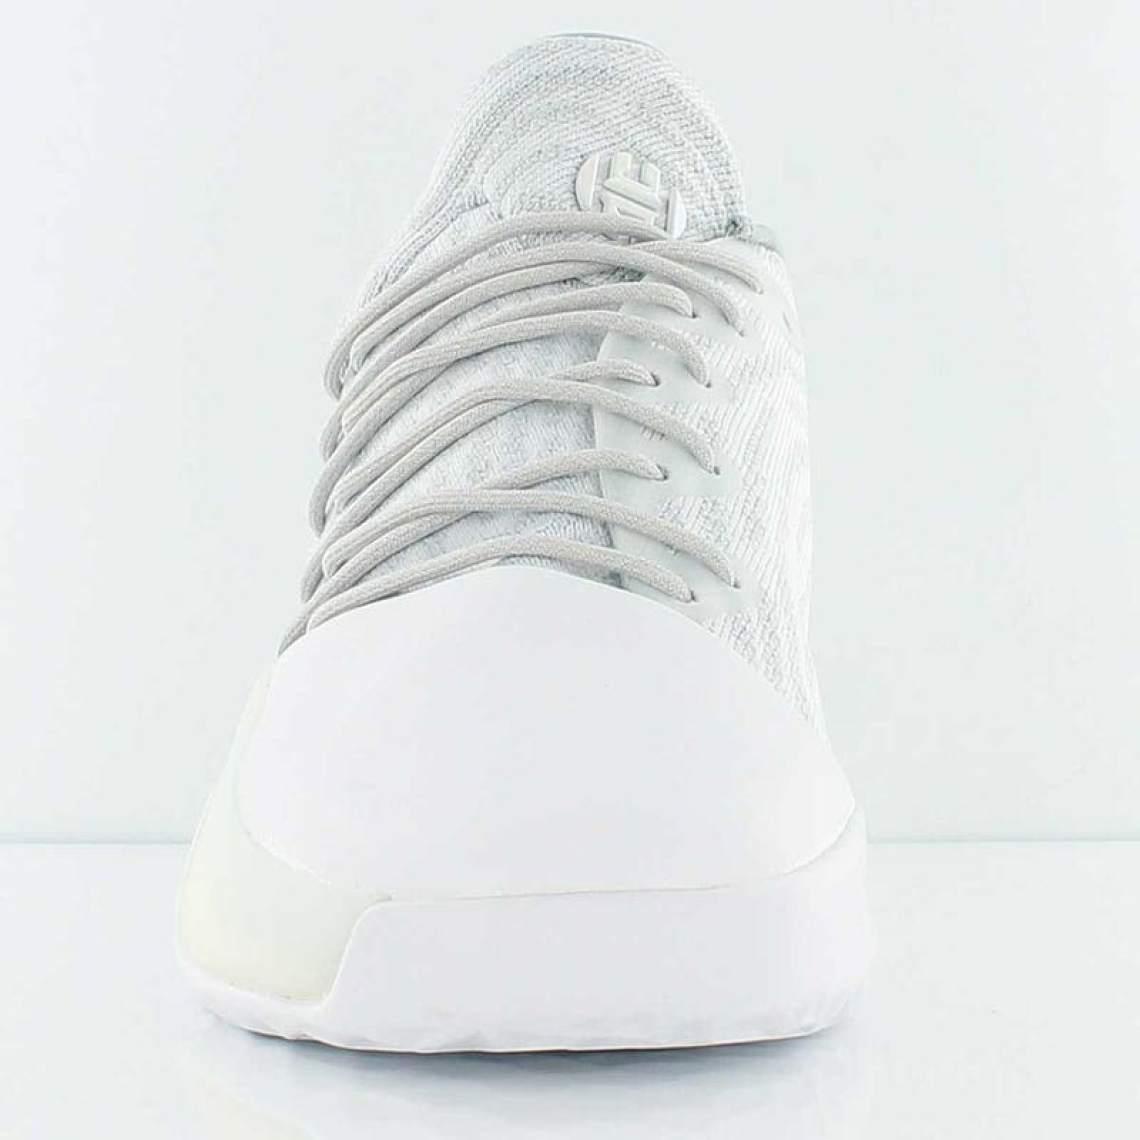 fe6704dc1ce adidas Harden Vol. 1